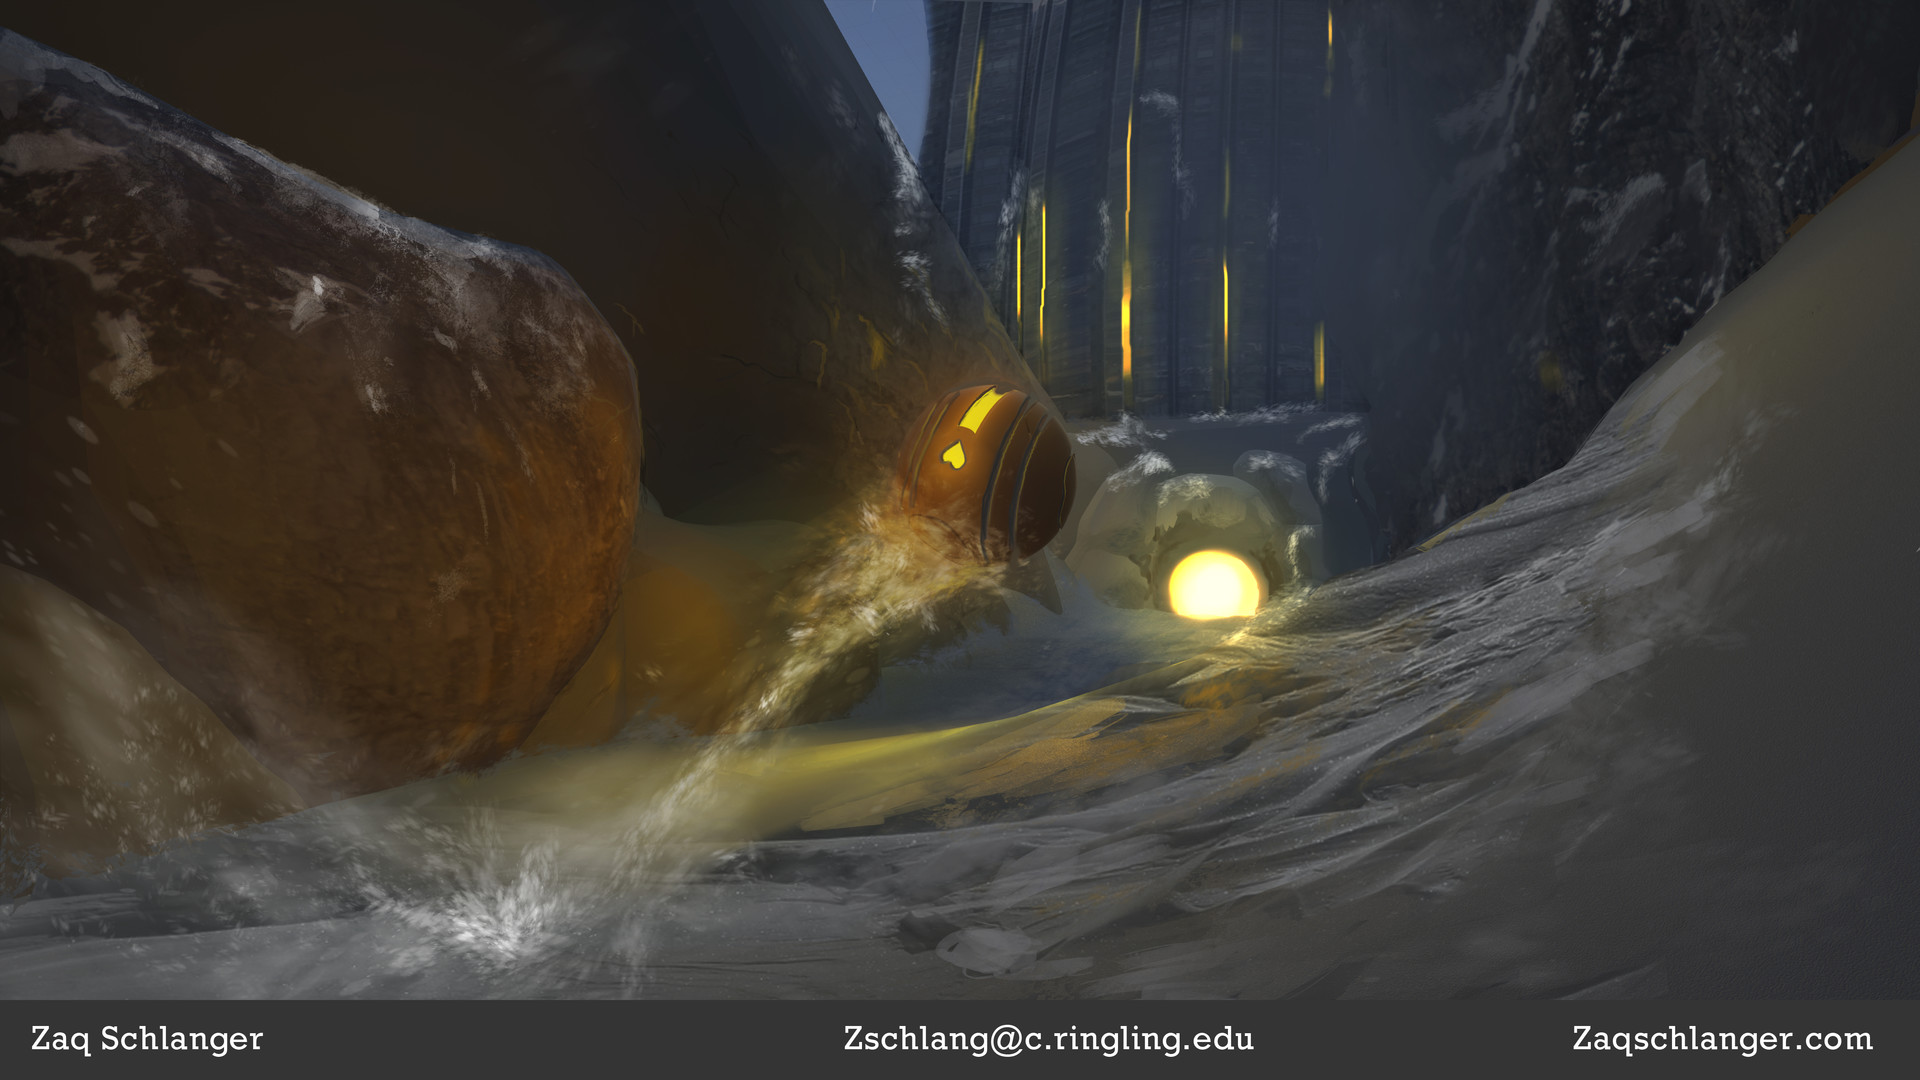 Zachary schlanger zschlang env 01